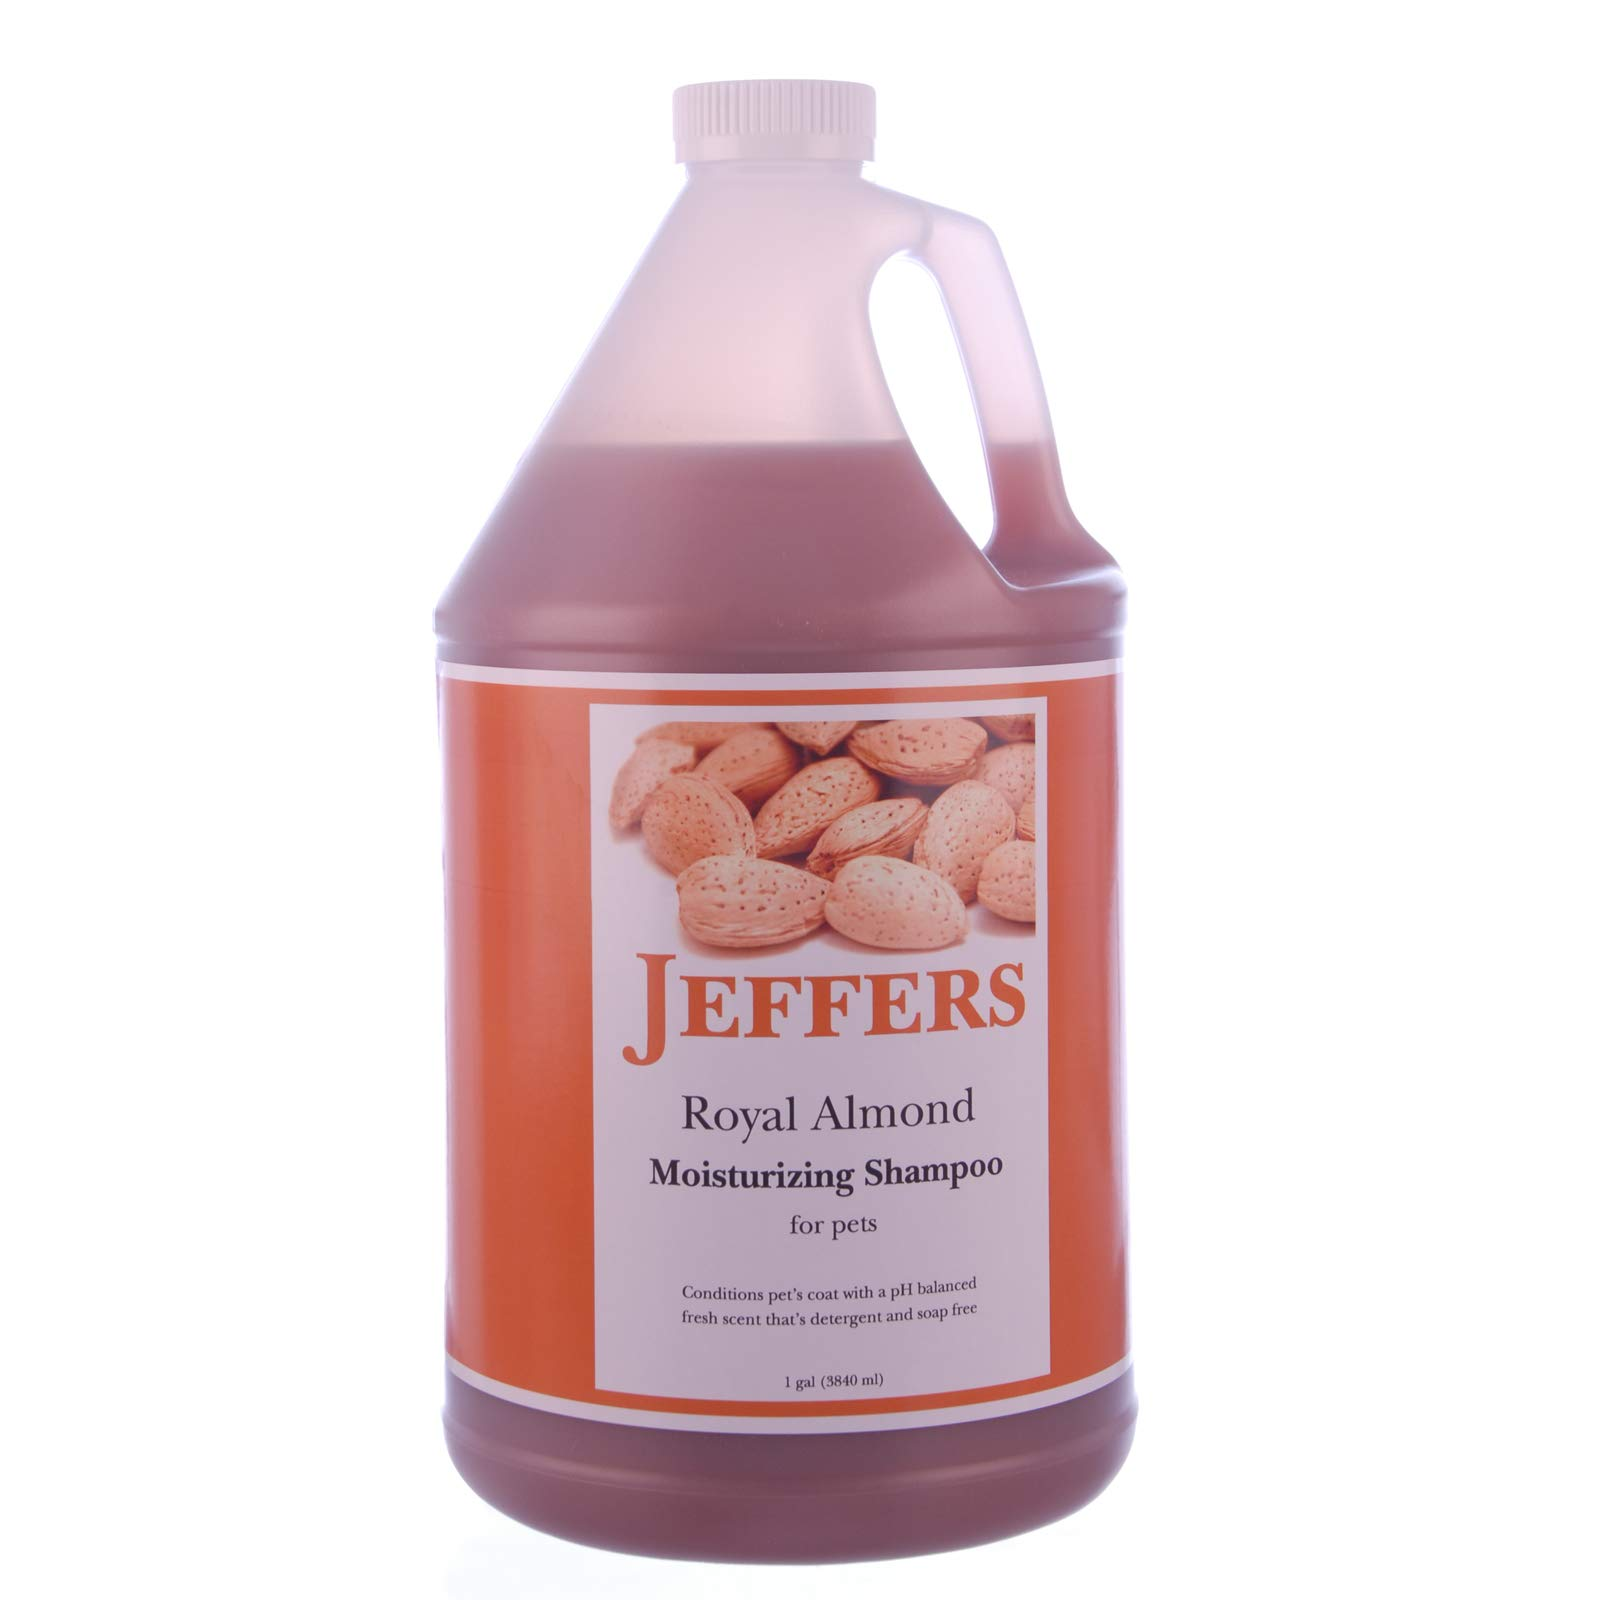 Jeffers Royal Almond Moisturizing Shampoo, 1 Gallon by Jeffers